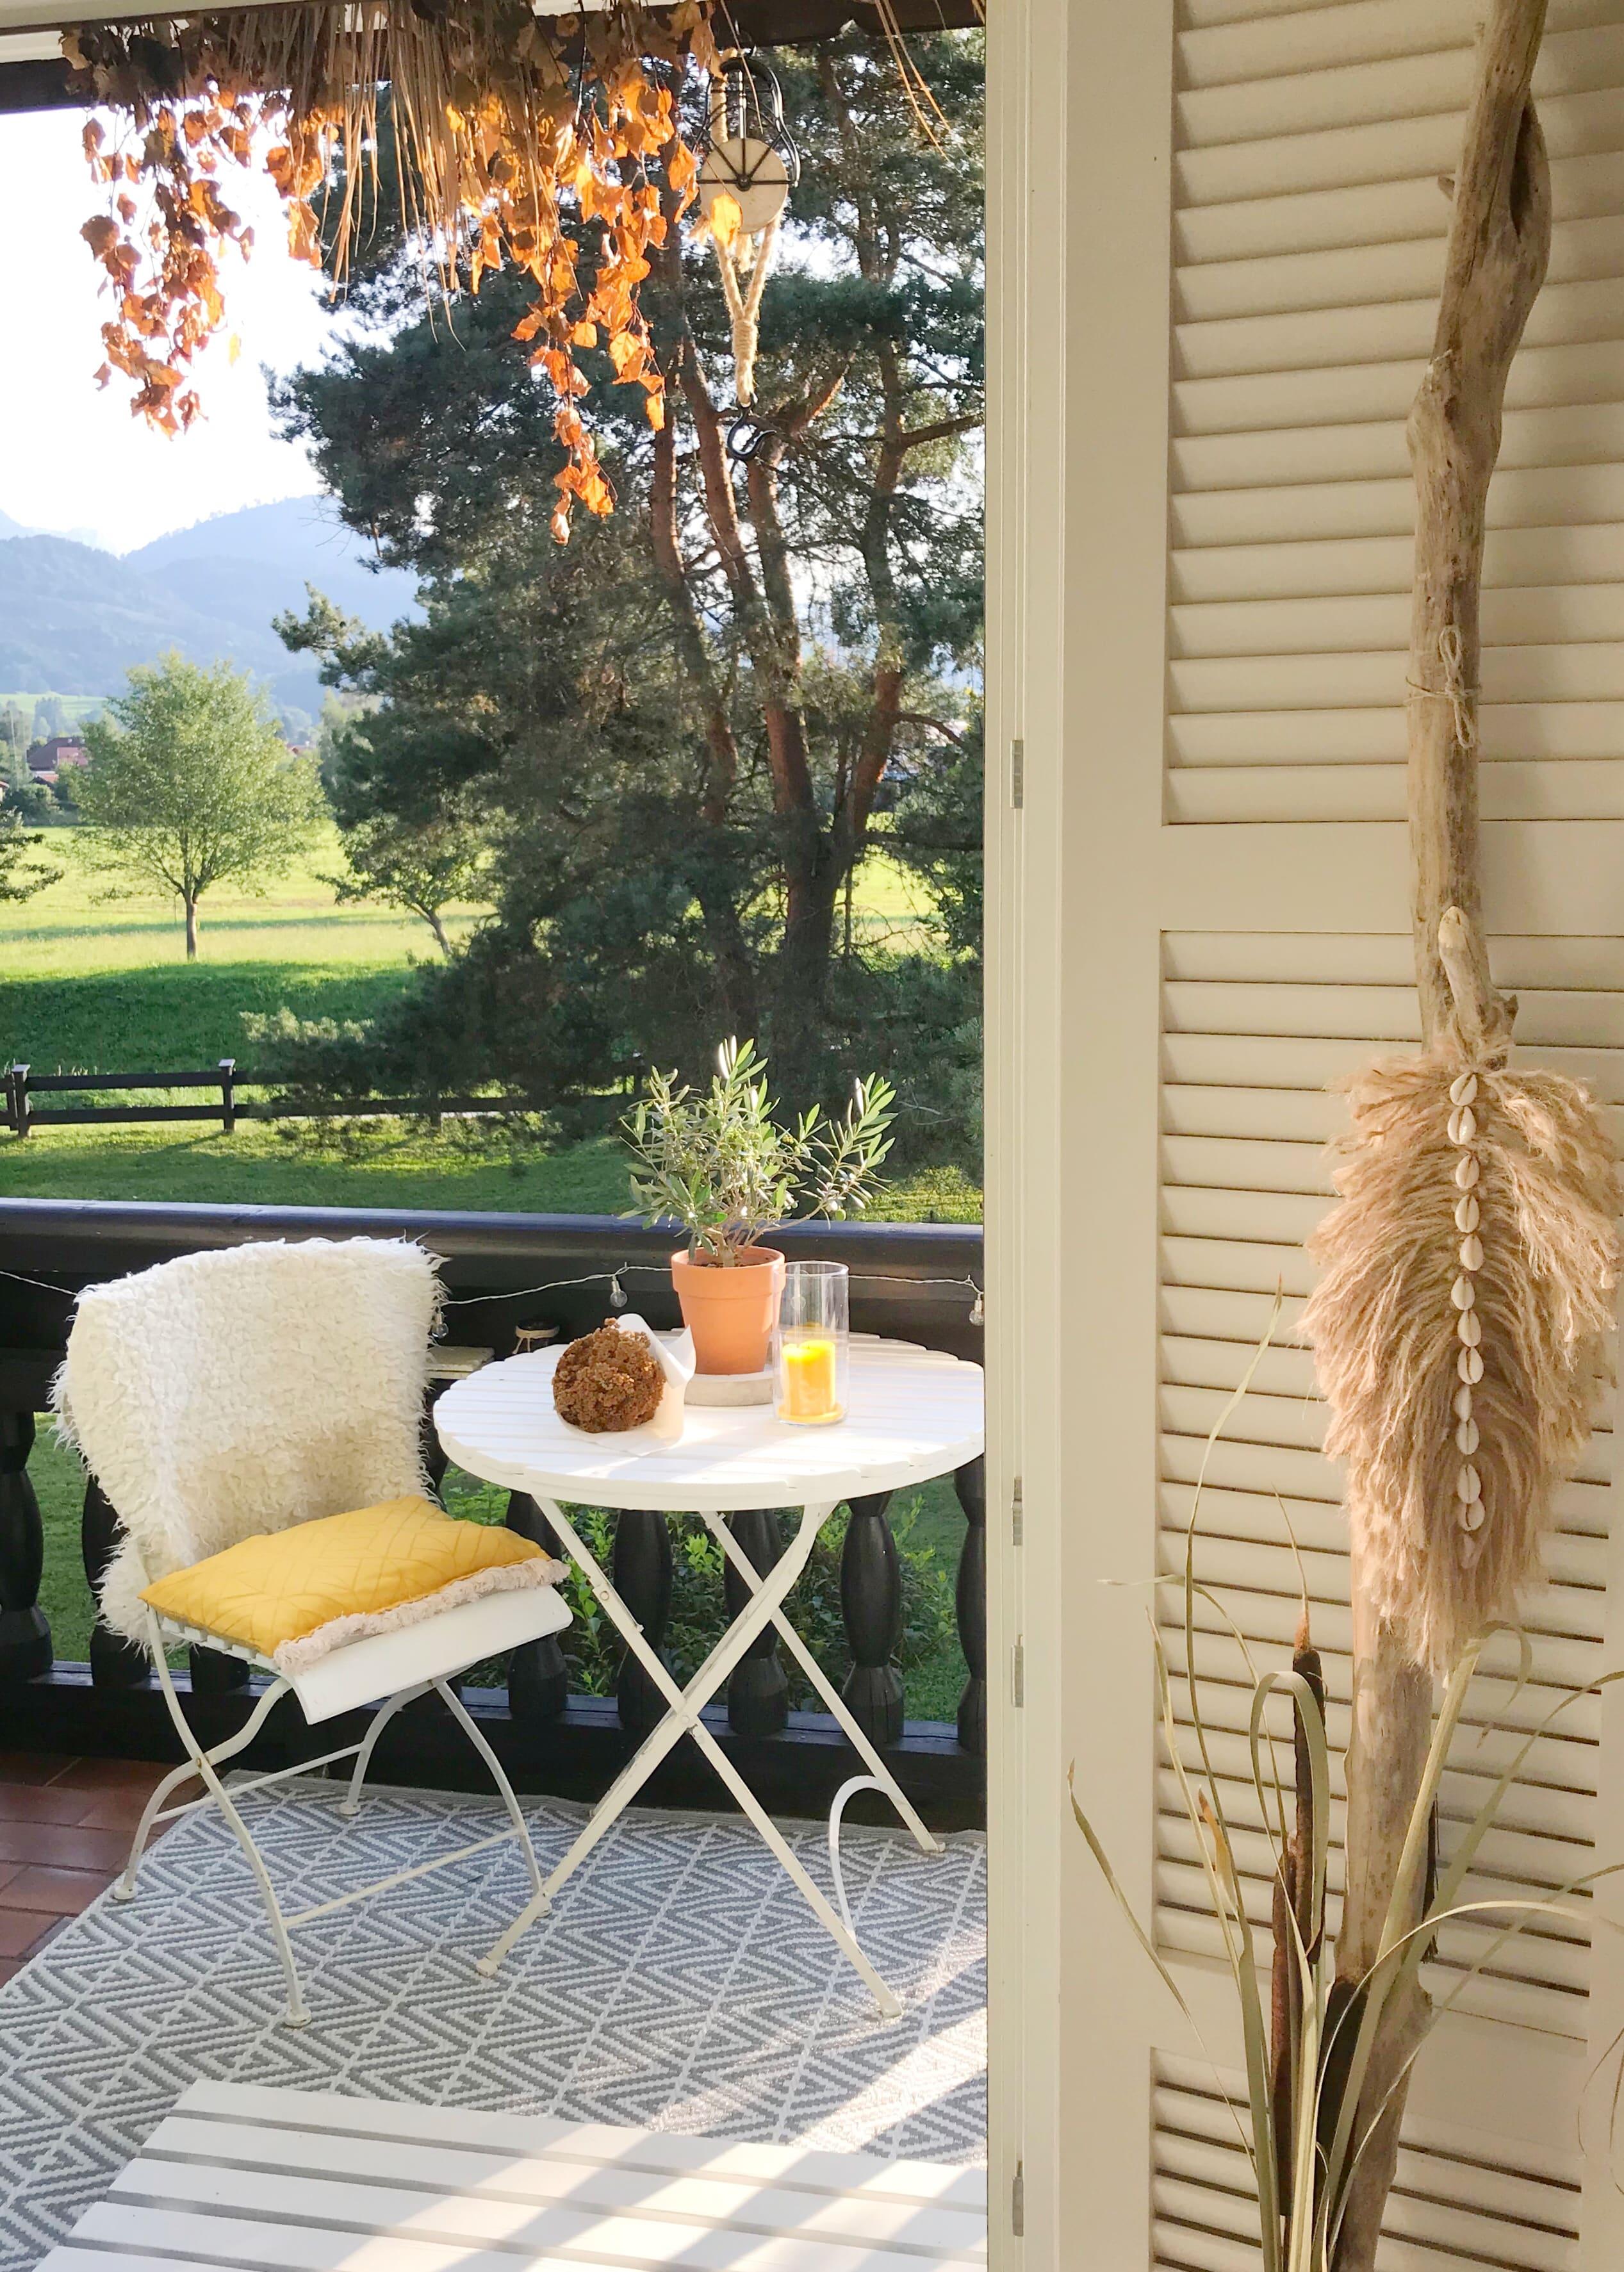 Kissen aus Geschirrhandtuch selber nähen. Do it Yourself Kissen. Balkon im Herbst. #chalet8, #Kissennähen